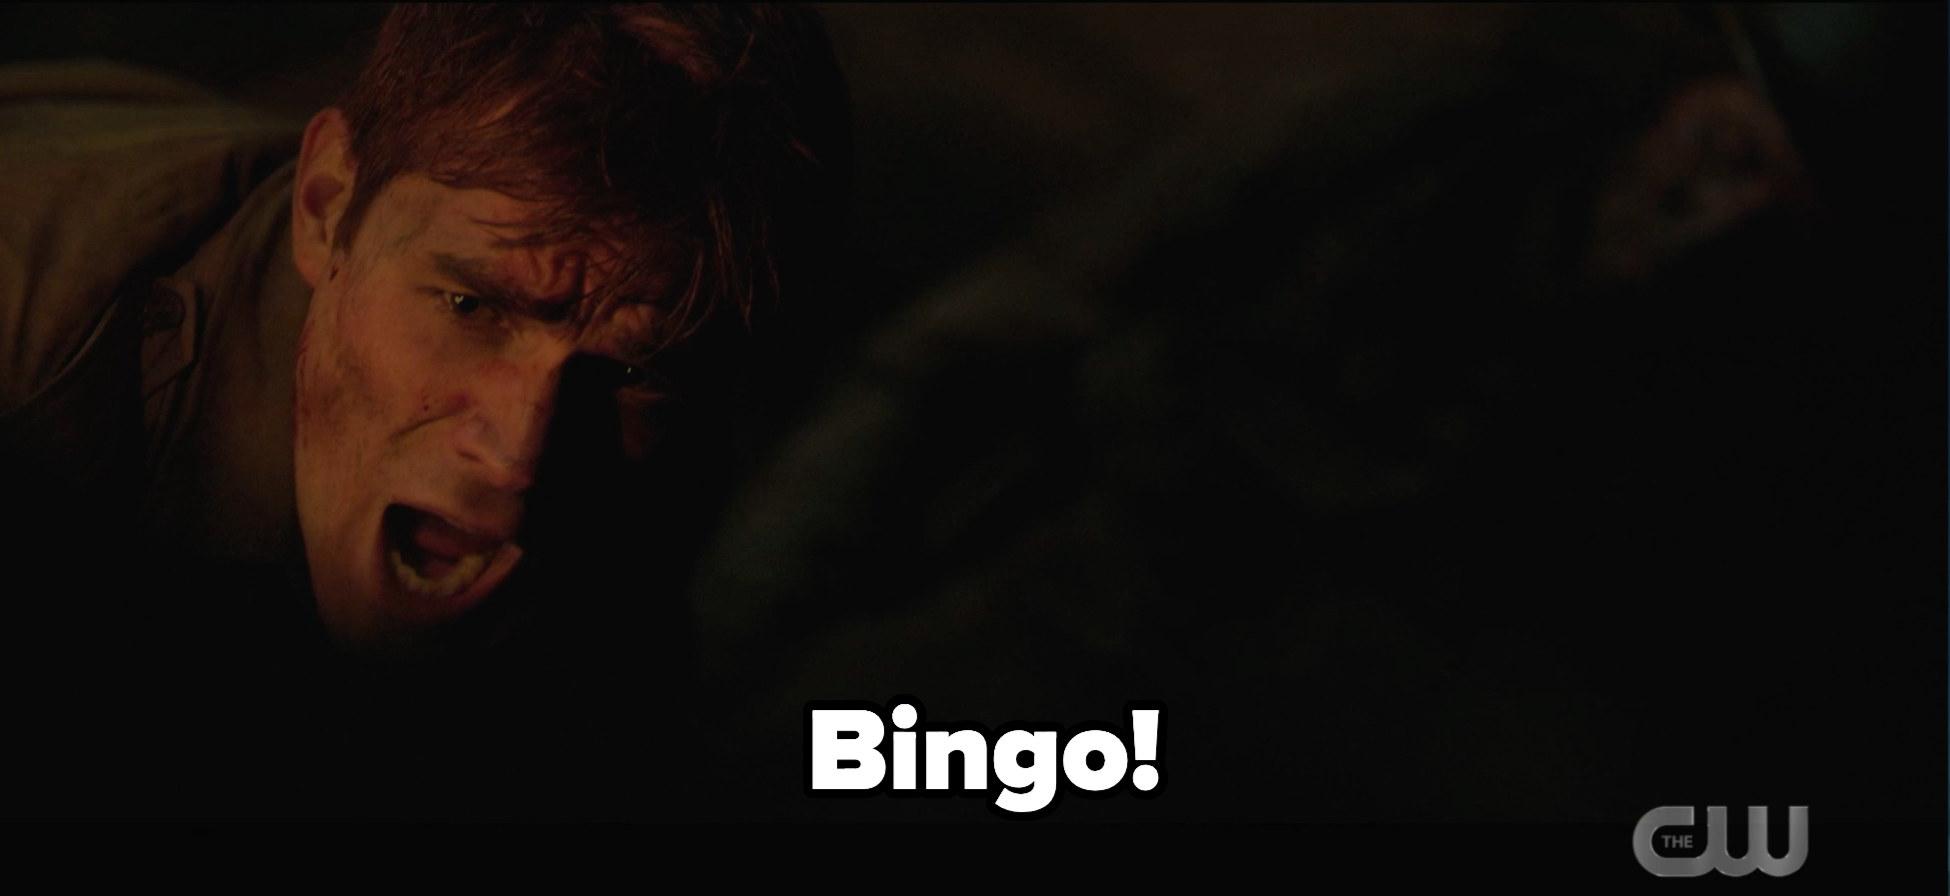 Archie shouting Bingo!